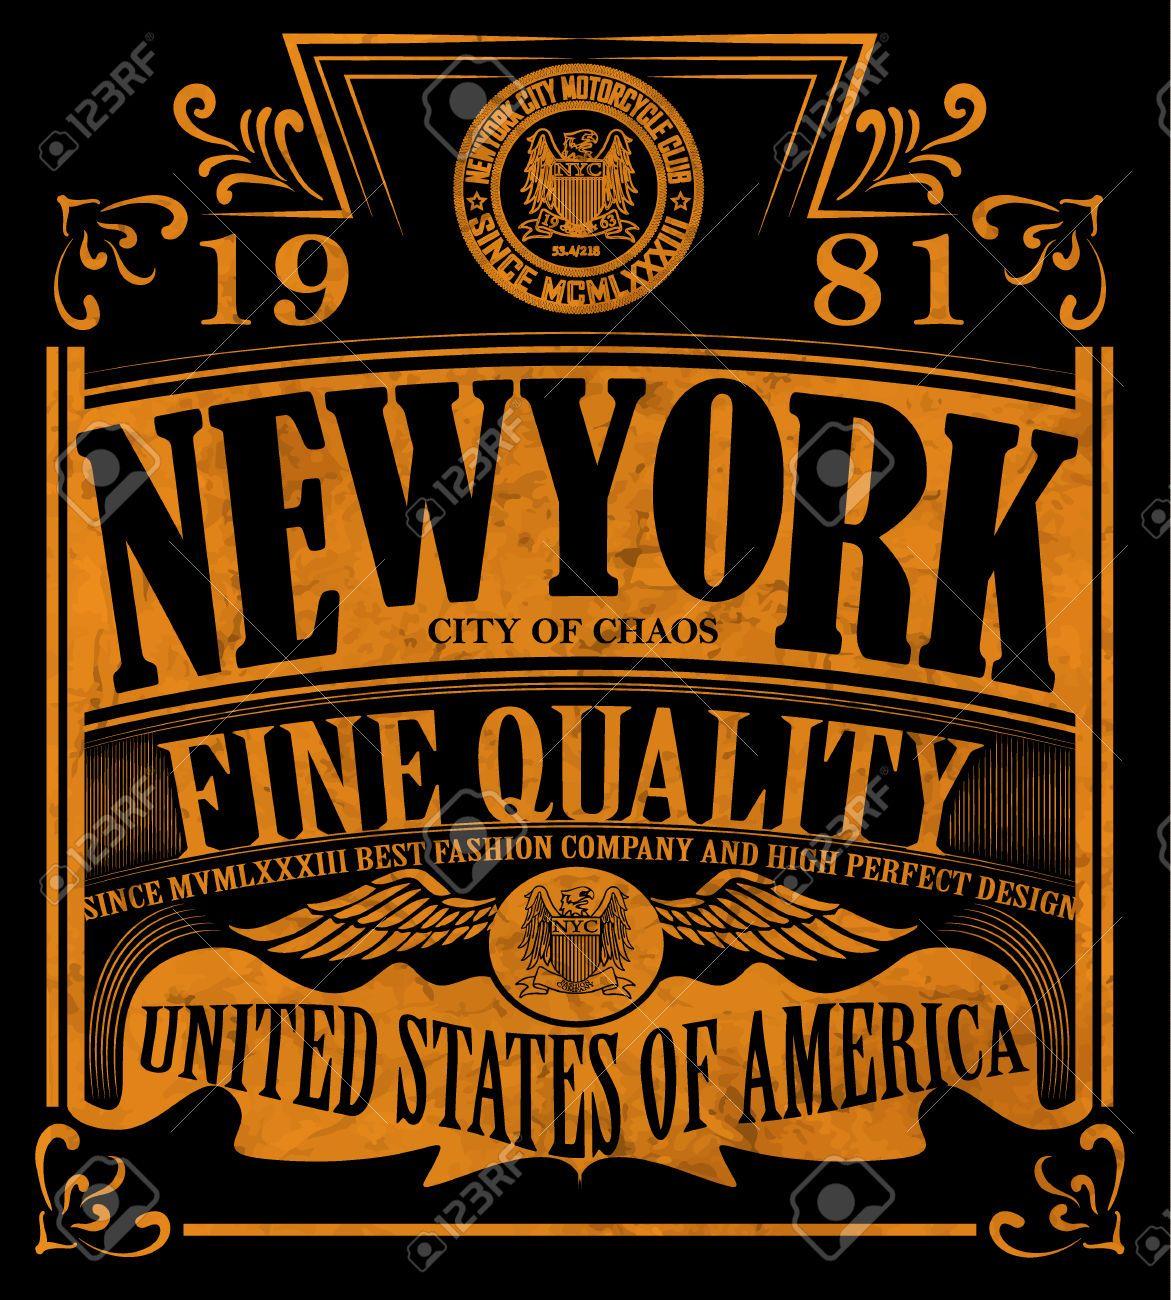 Design a t shirt nyc - 45203296 New York Vintage Slogan Man T Shirt